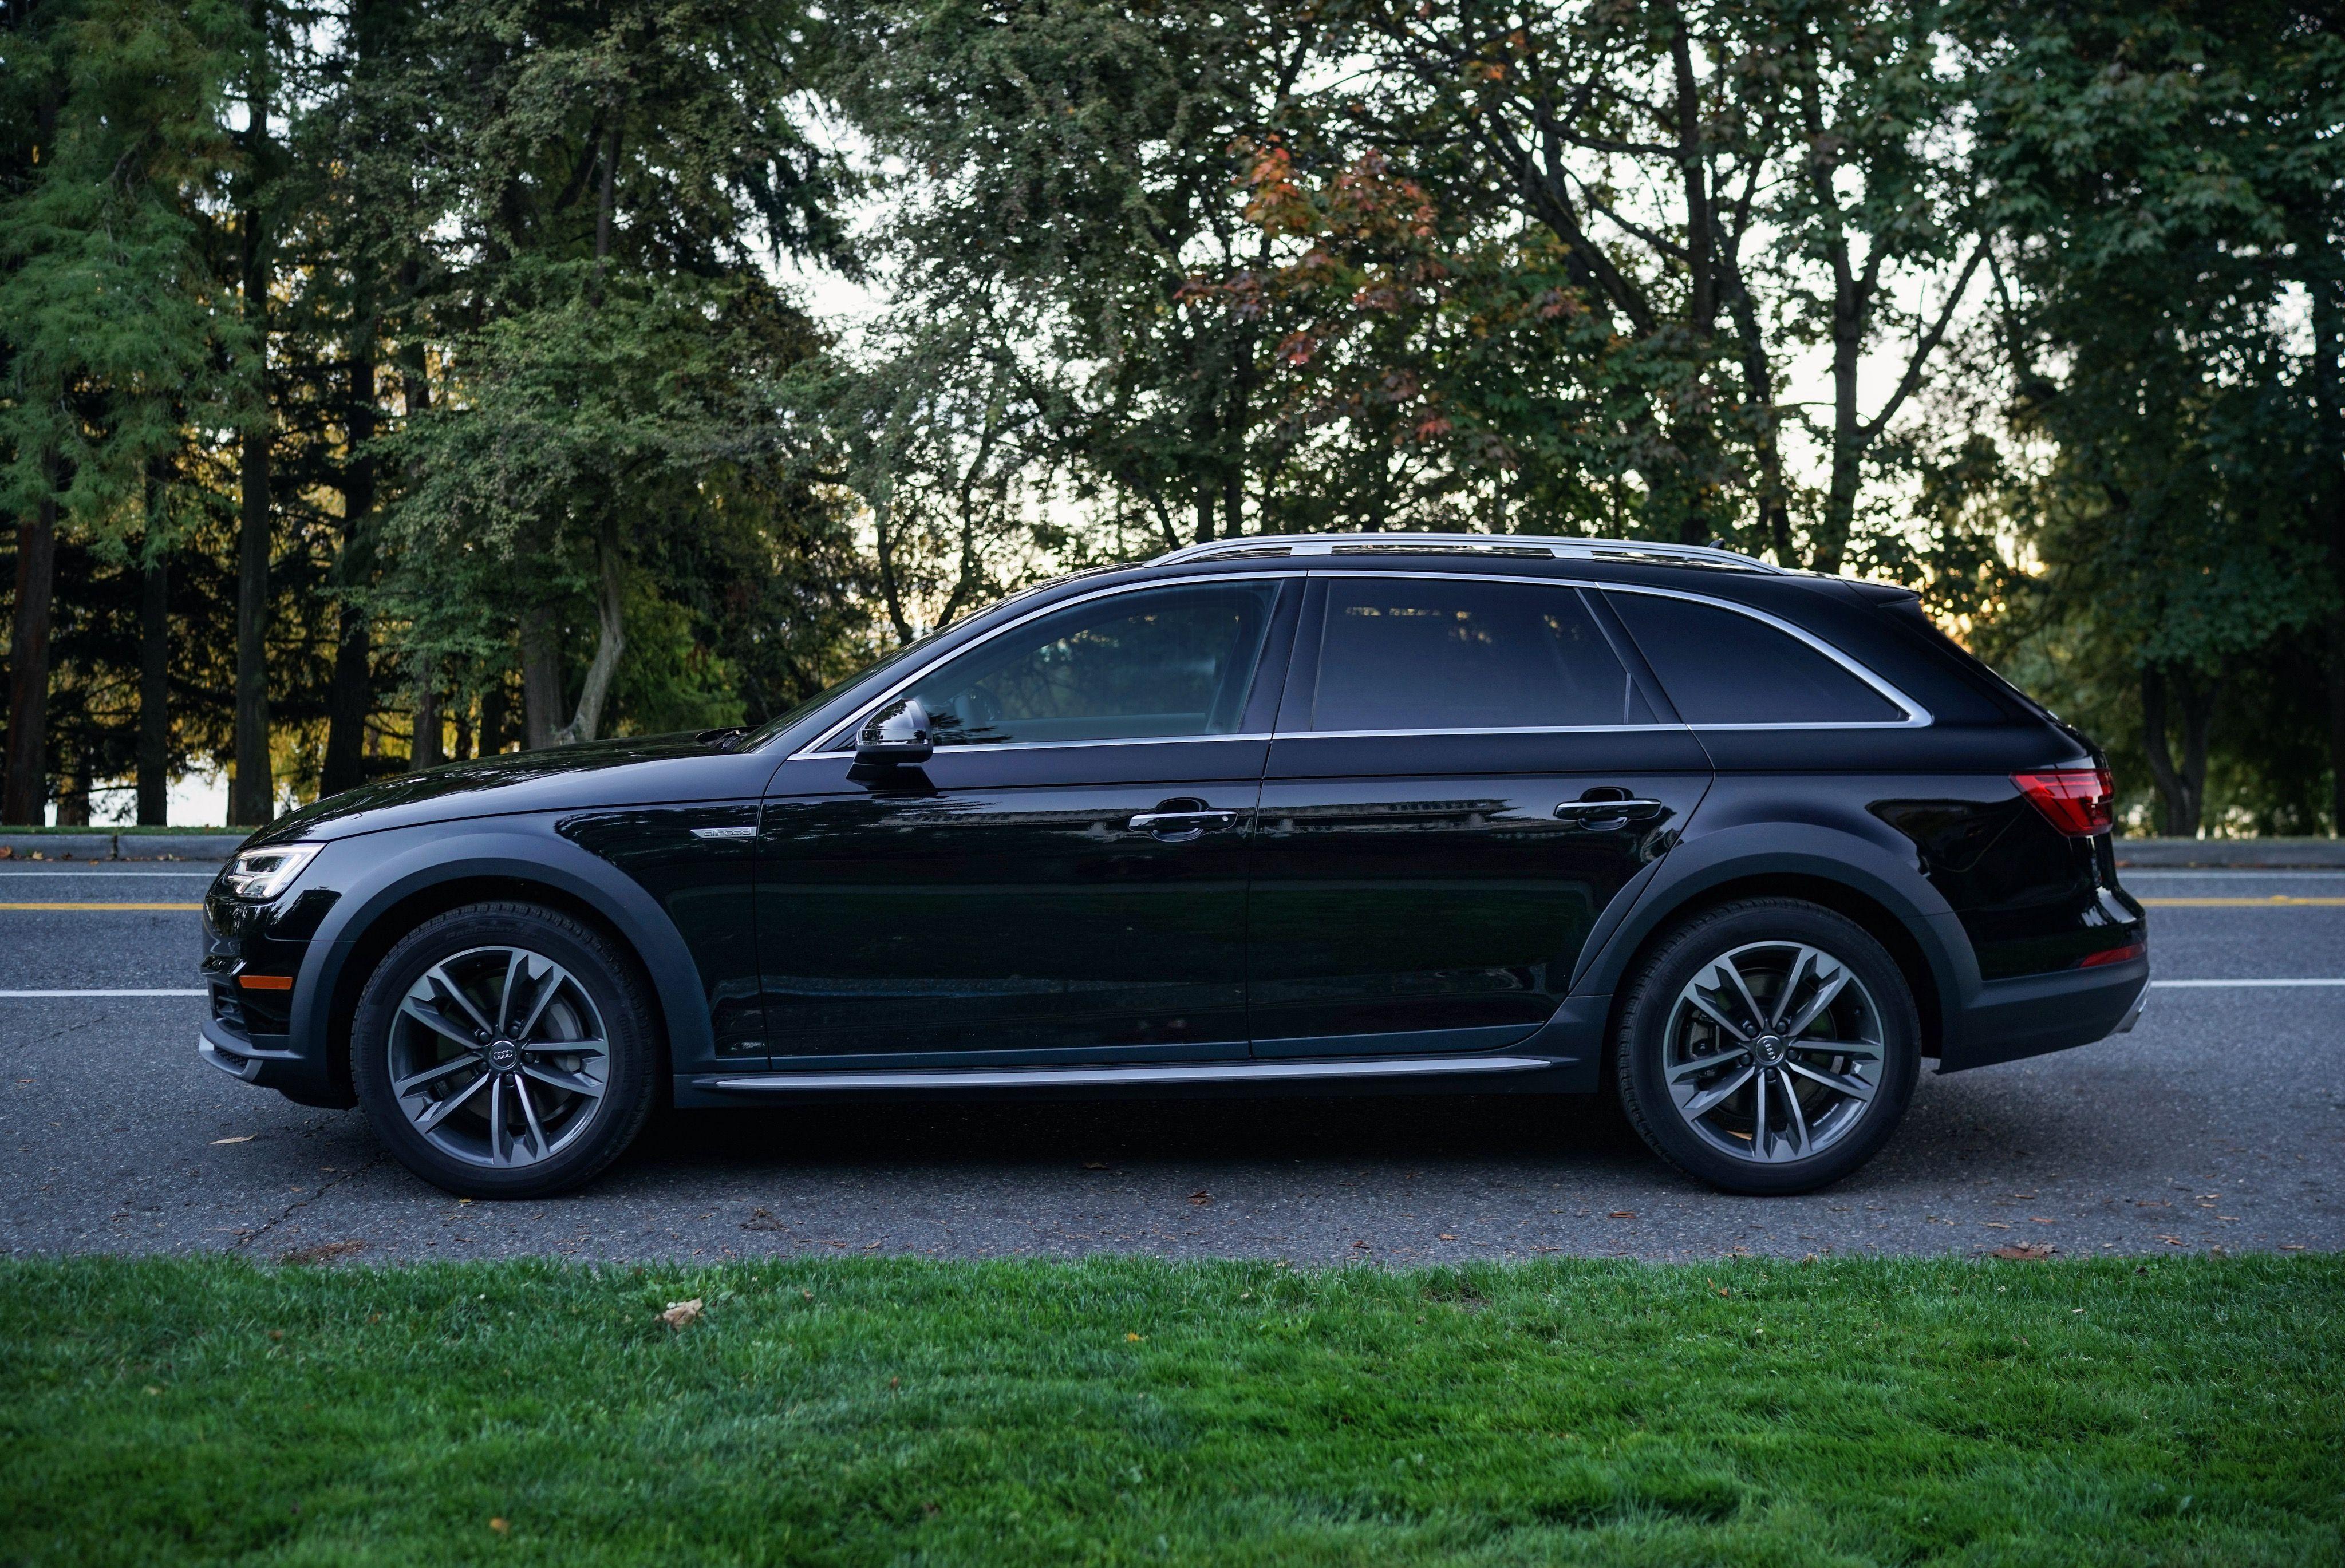 Brilliant Black Audi Allroad Green Lake Seattle Wa Audiseattle Com Black Audi Audi Allroad Audi Dealership